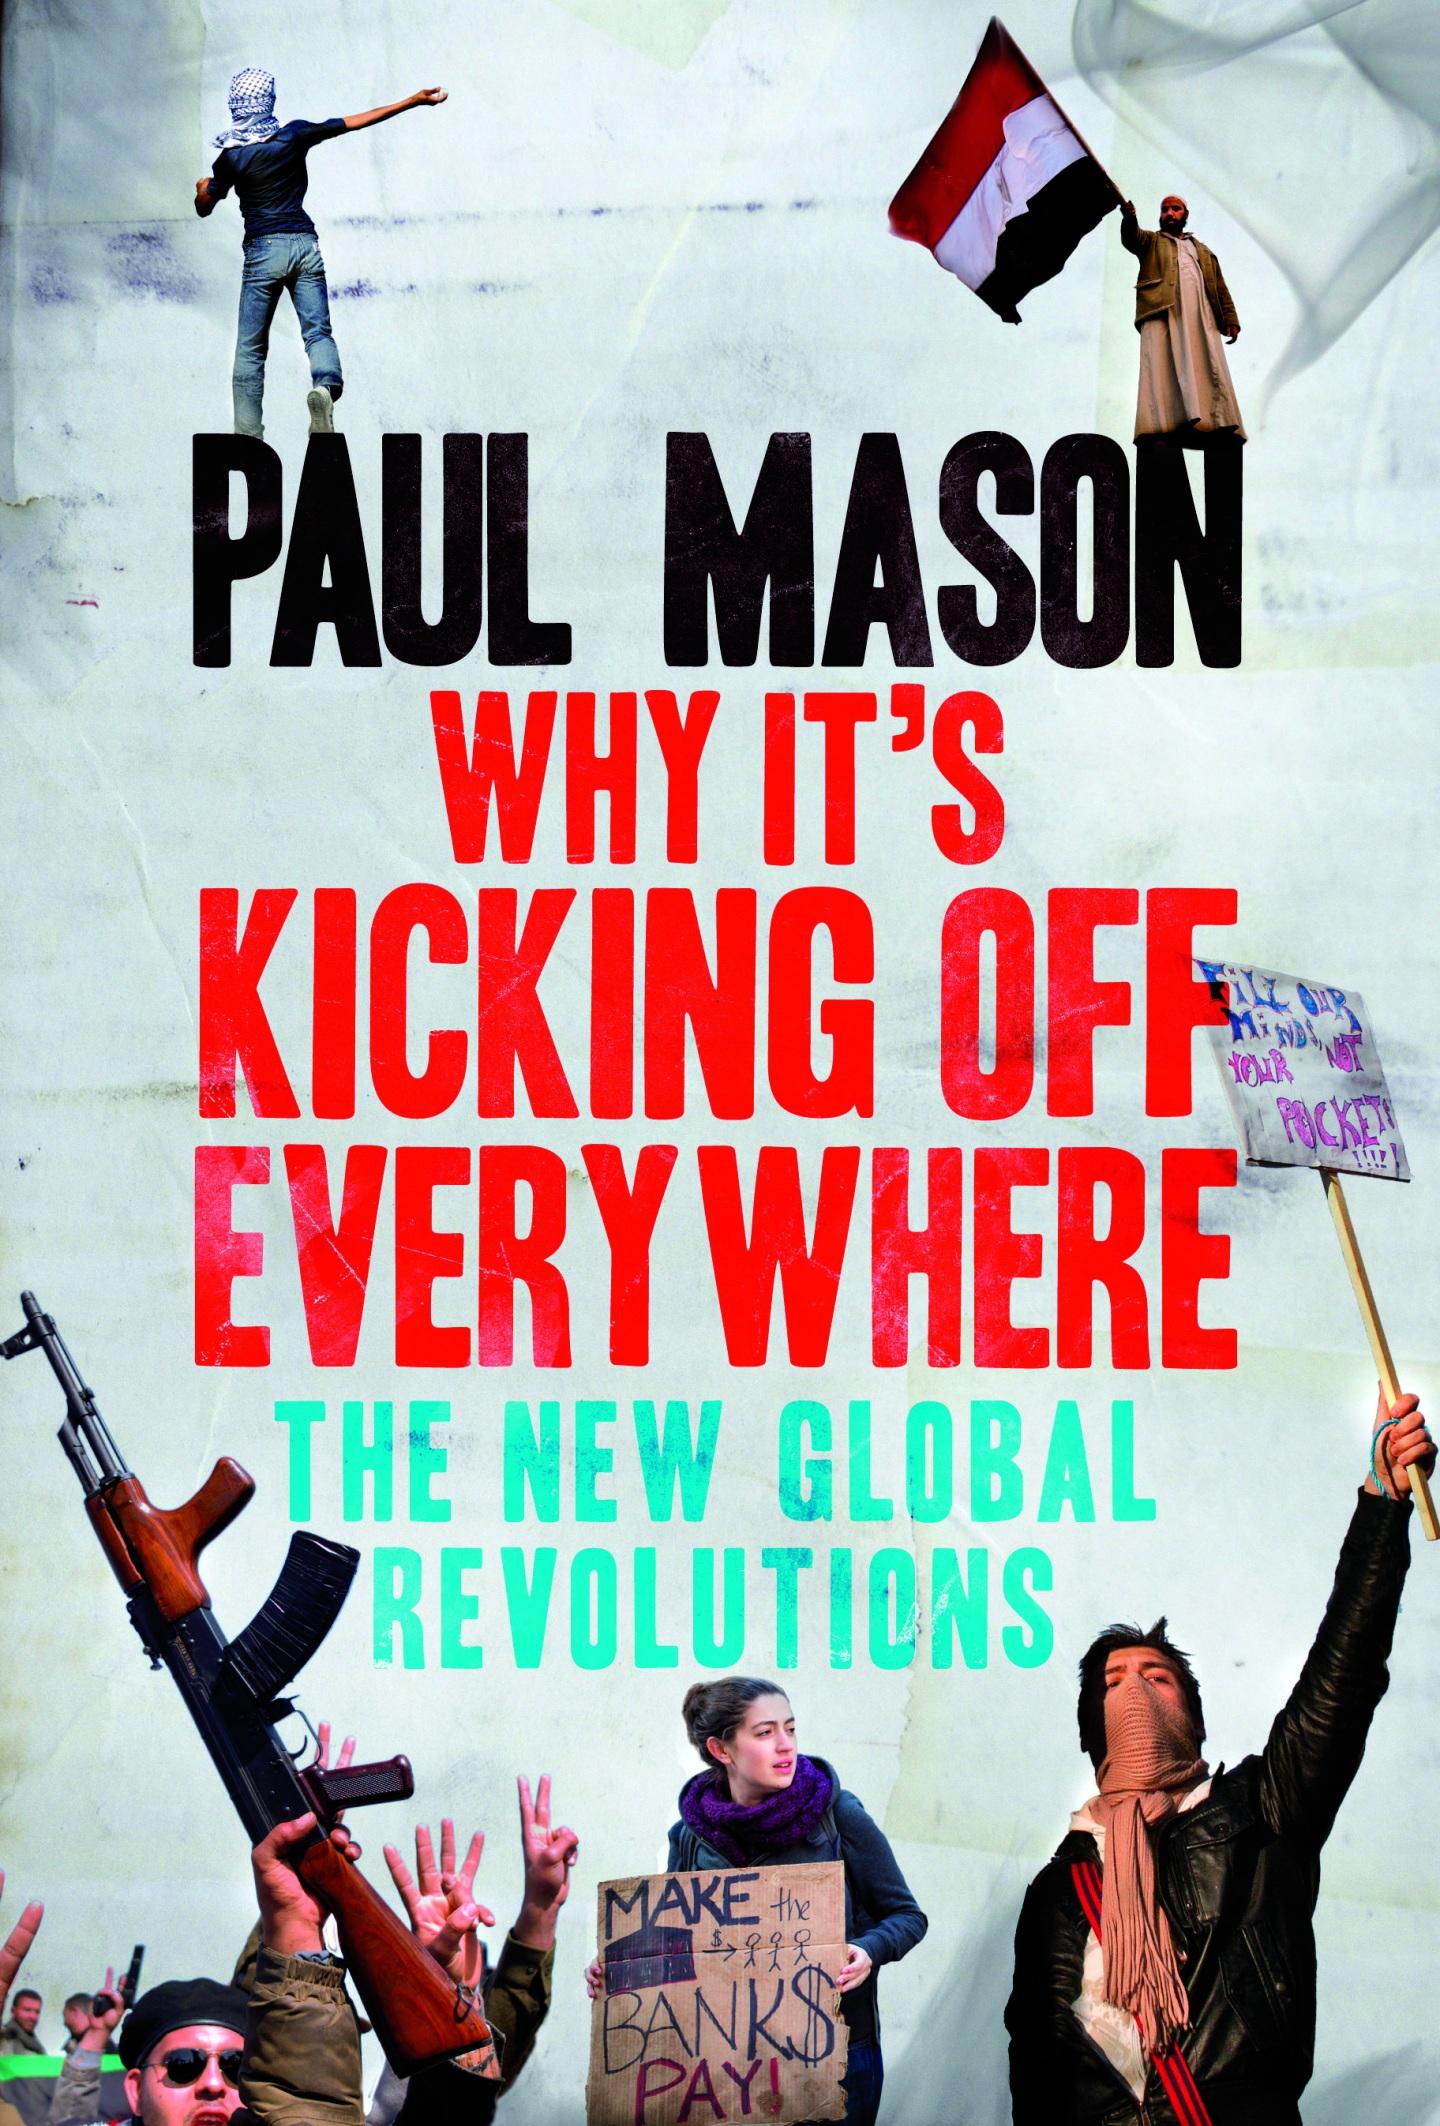 Paul Mason: The Global Revolutions, Social Networking & The Demonisation ofArabs